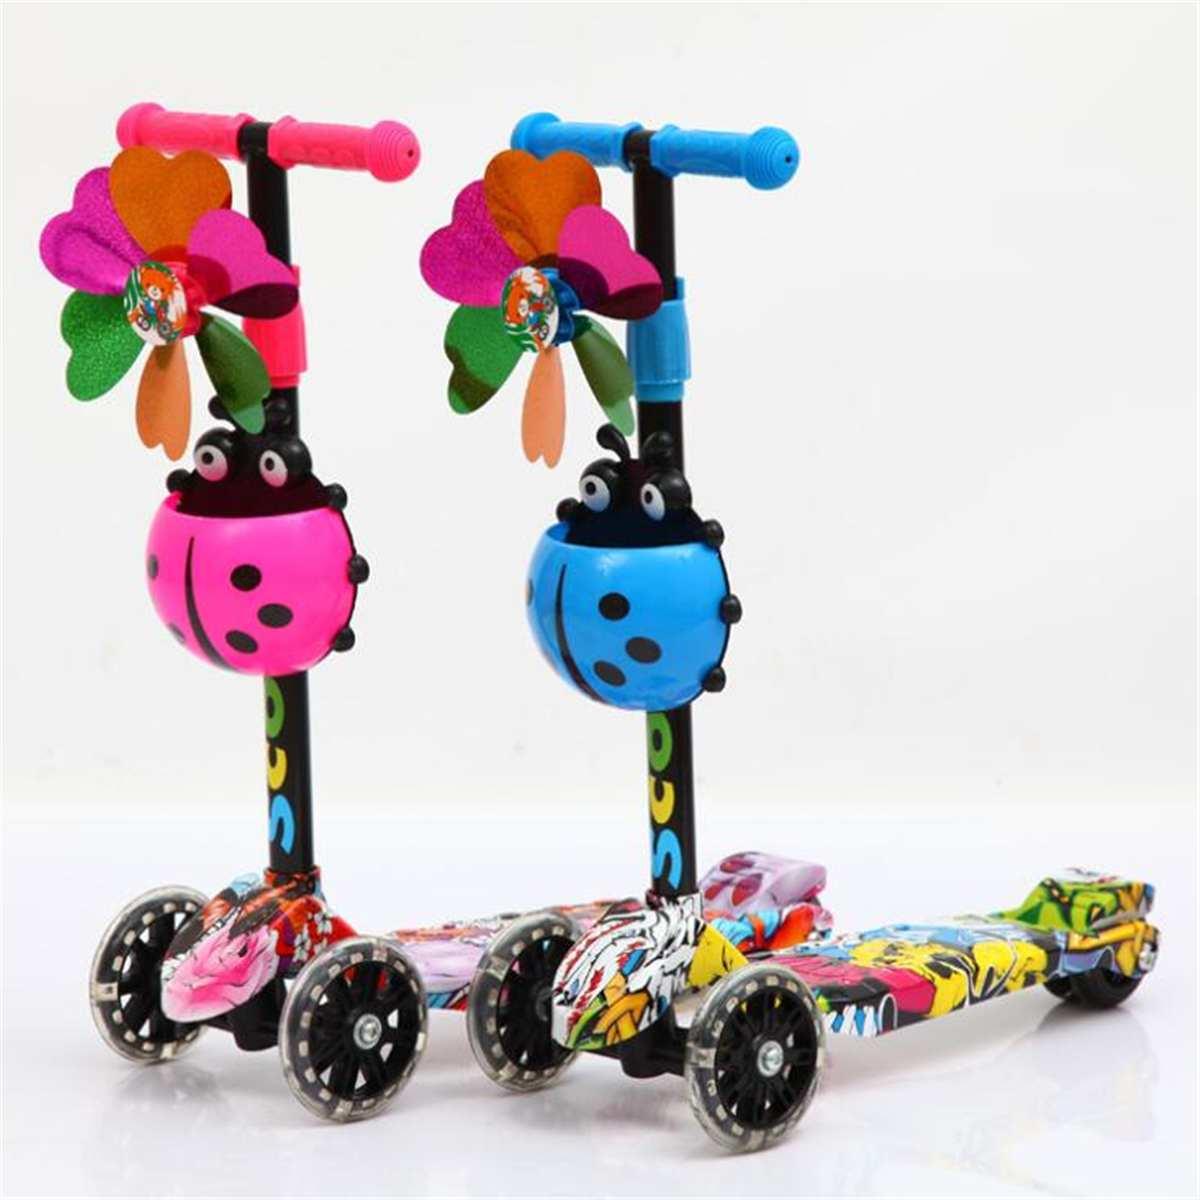 Children's Adjustable Unisex Kick Scooter LED Light Up 4 wheel Foot Scooters Children City Roller Skateboard Gifts For Kids